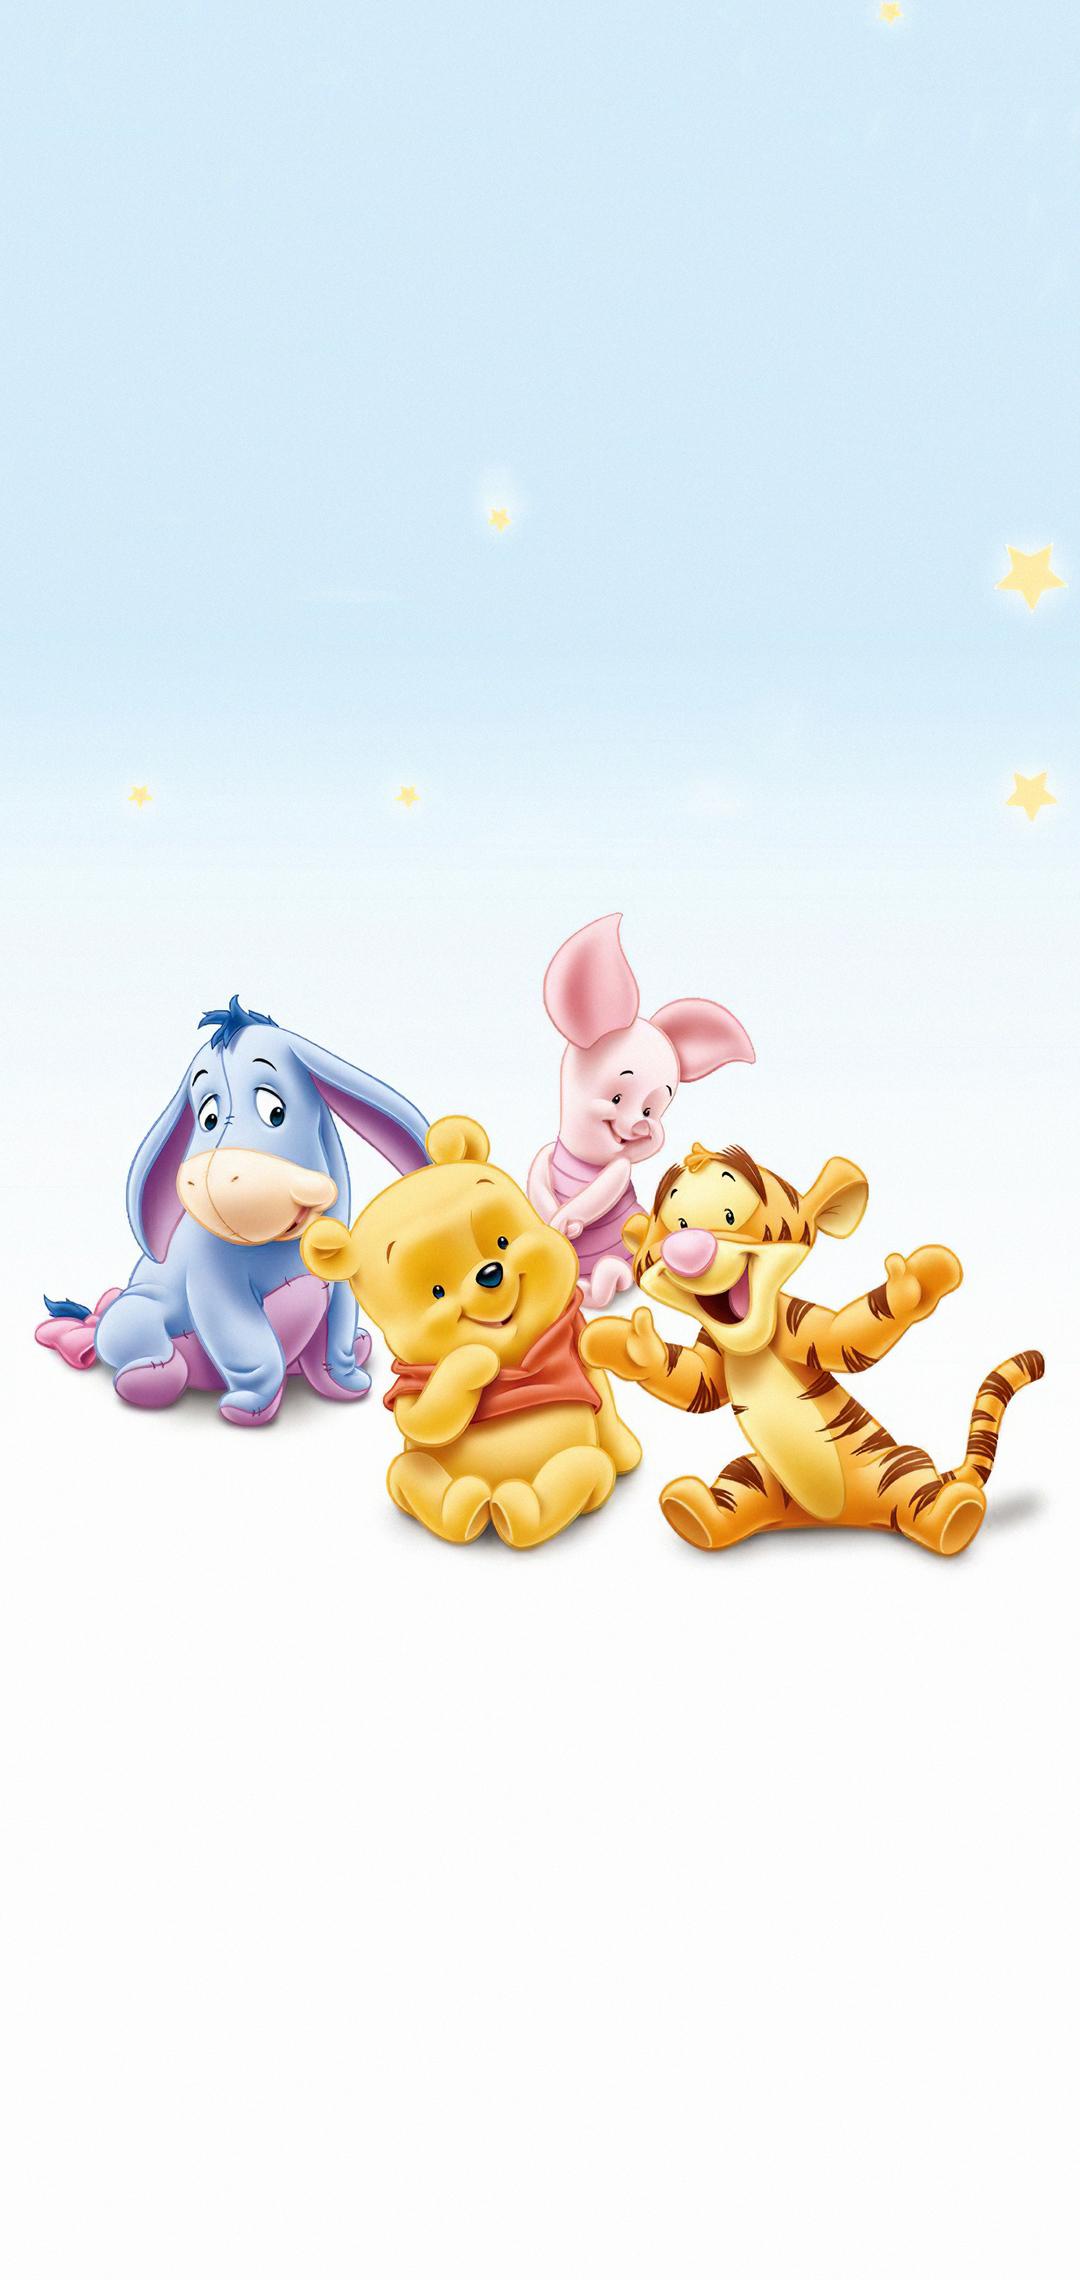 winnie-the-pooh-tigger-eeyore-and-piglet-8q.jpg